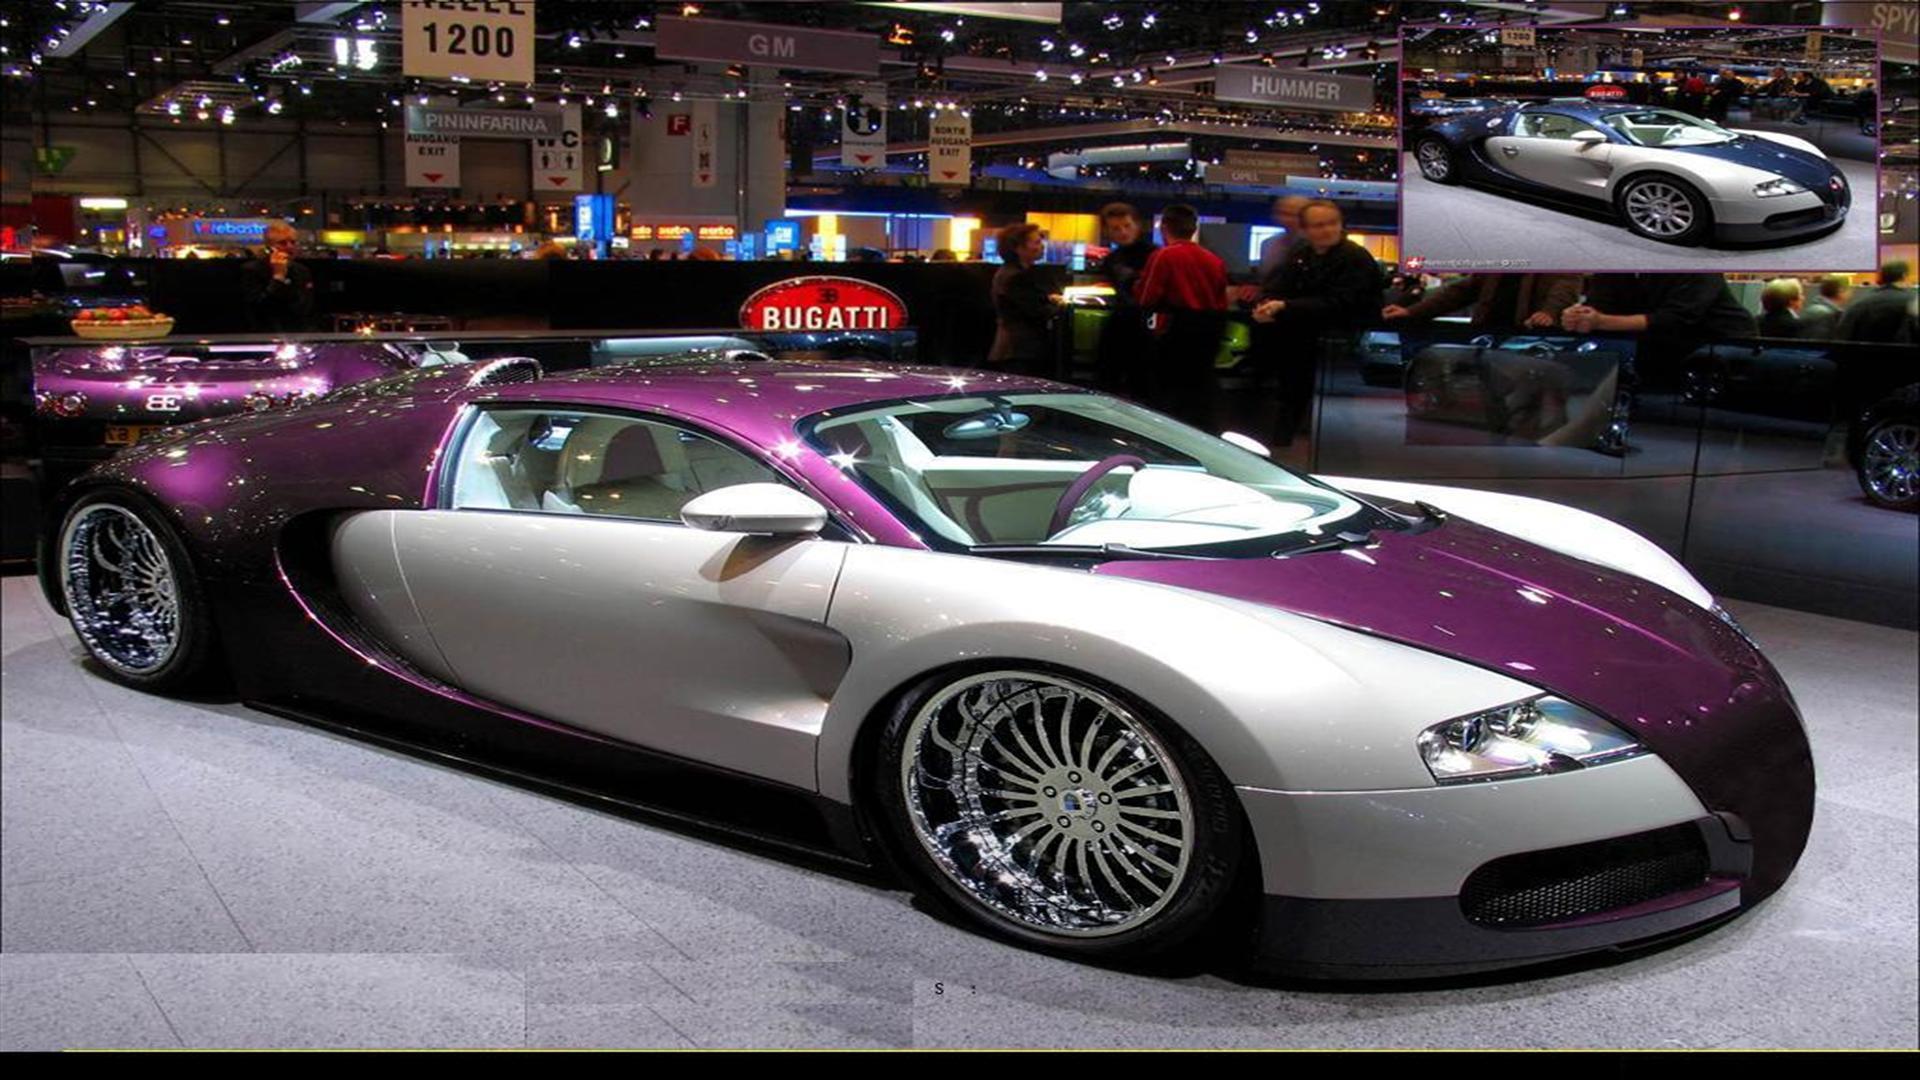 Bugatti Cars Wallpapers 1080p Bugatti Iphone Wallpaper Hd